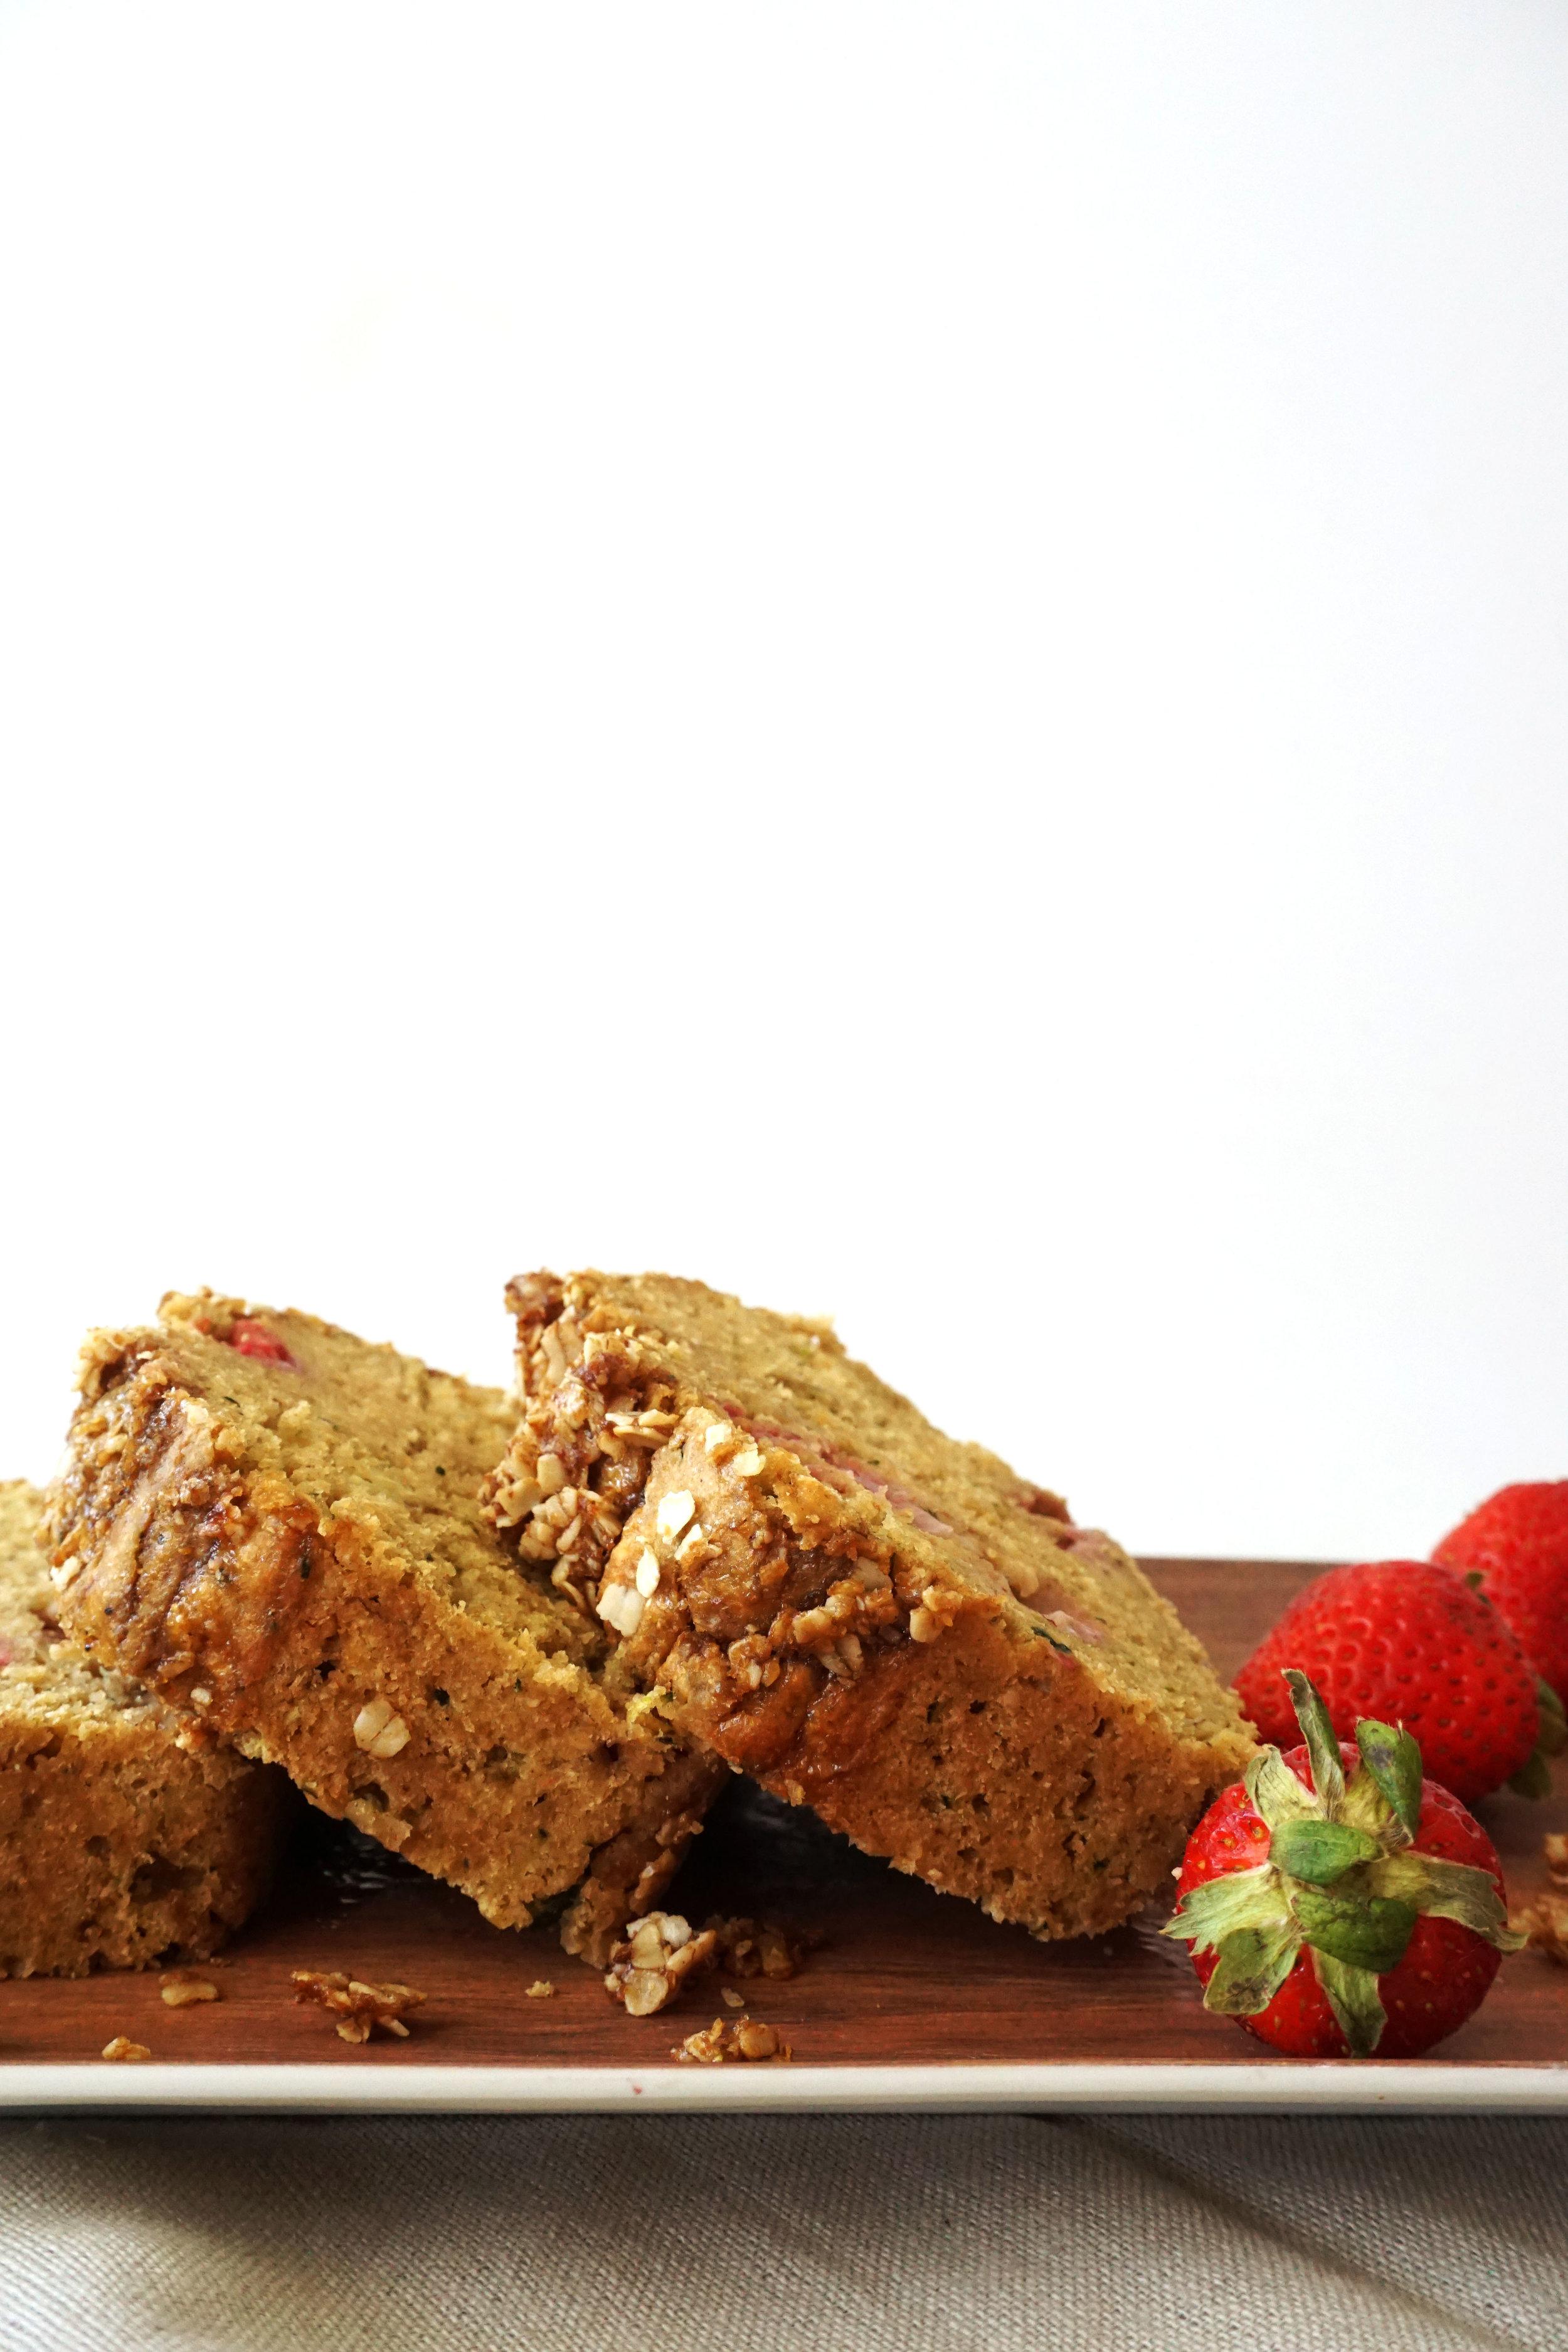 Whole-Wheat Zucchini Strawberry Crumble Bread (Dairy-free)